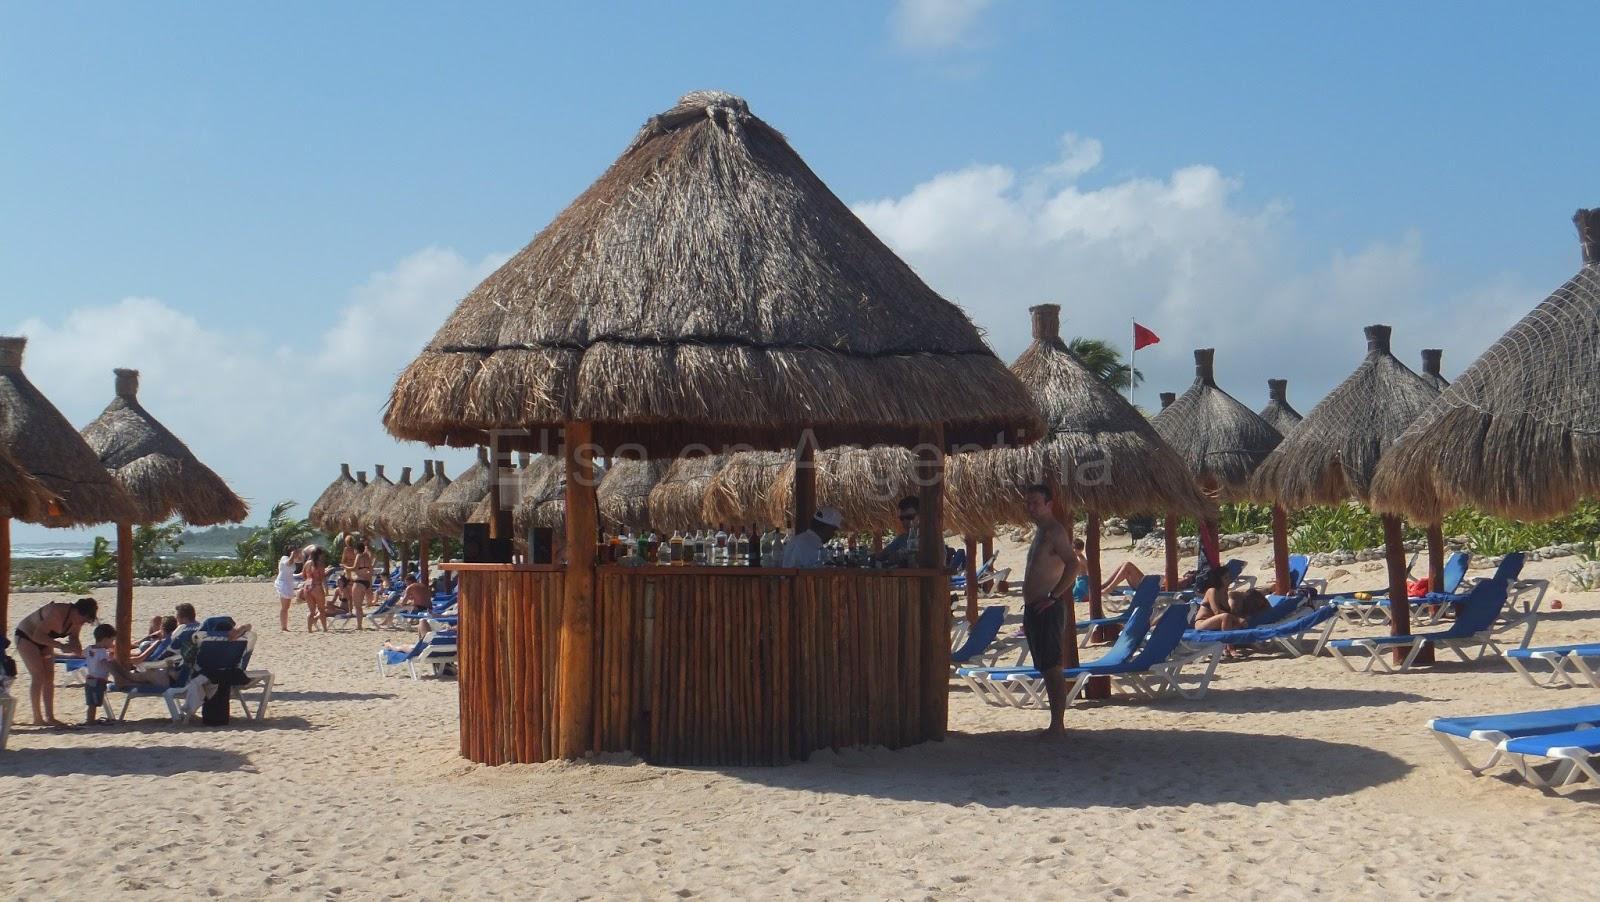 Bahía Príncipe. Días de descanso a la mexicana en Akumal